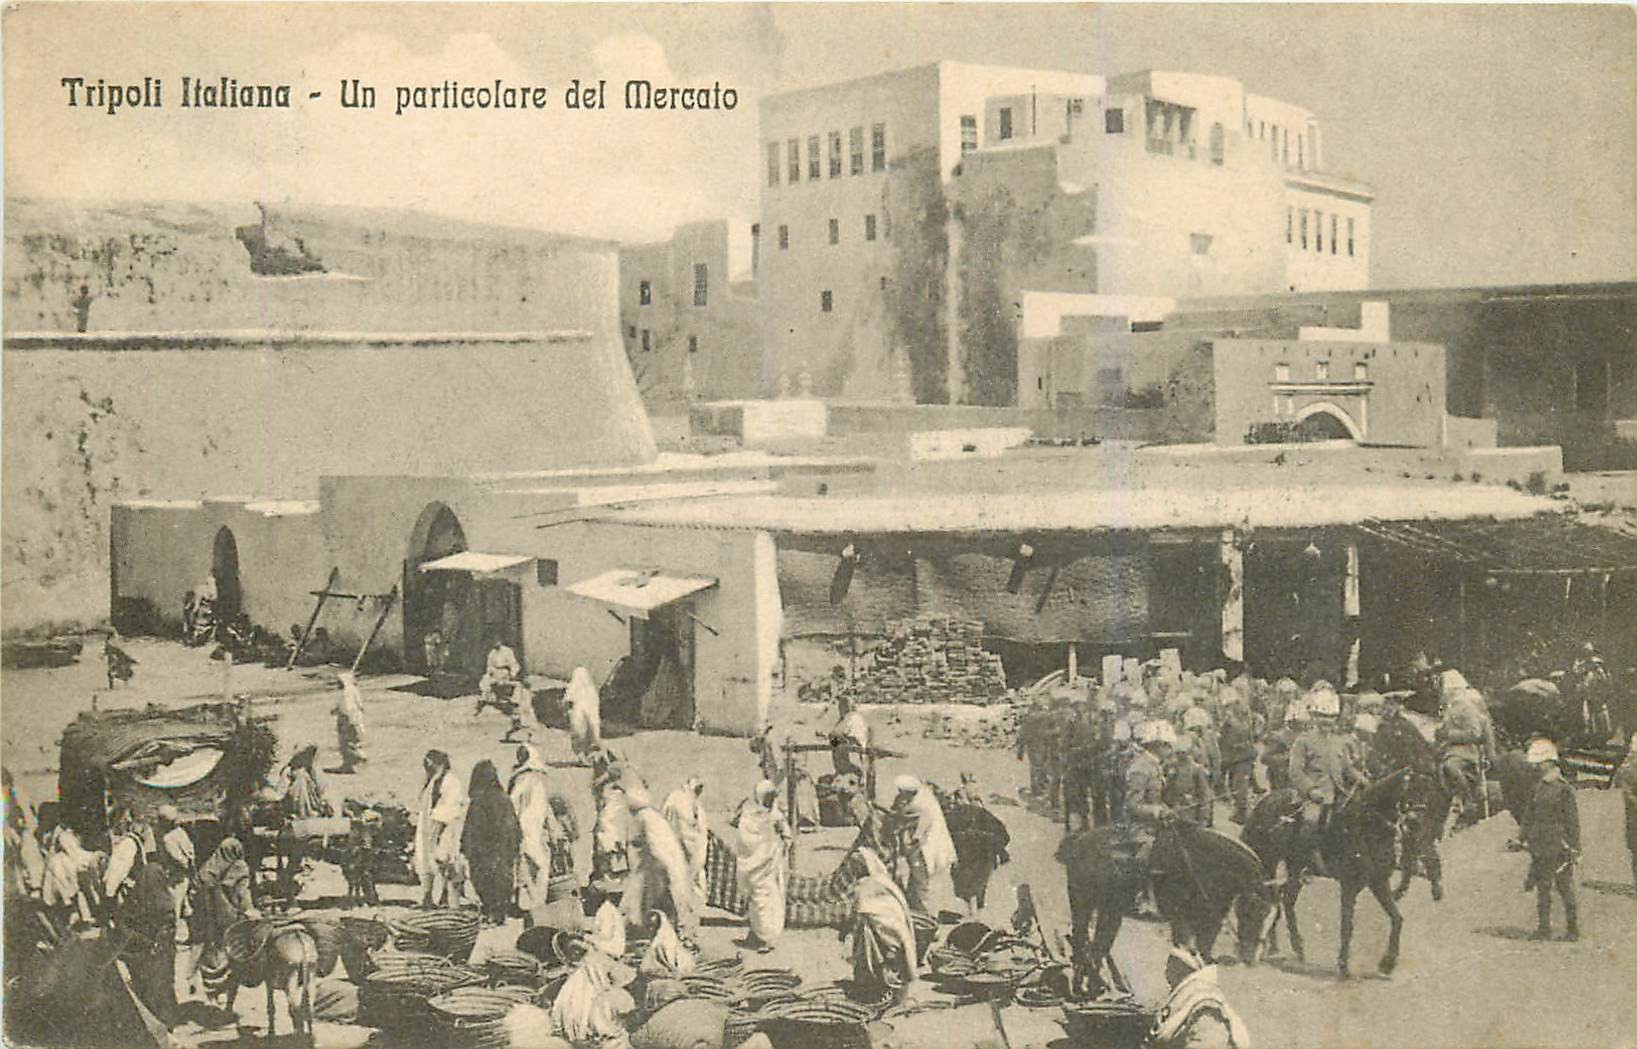 WW LIBYE. Tripoli Italiana il Mercato vers 1910